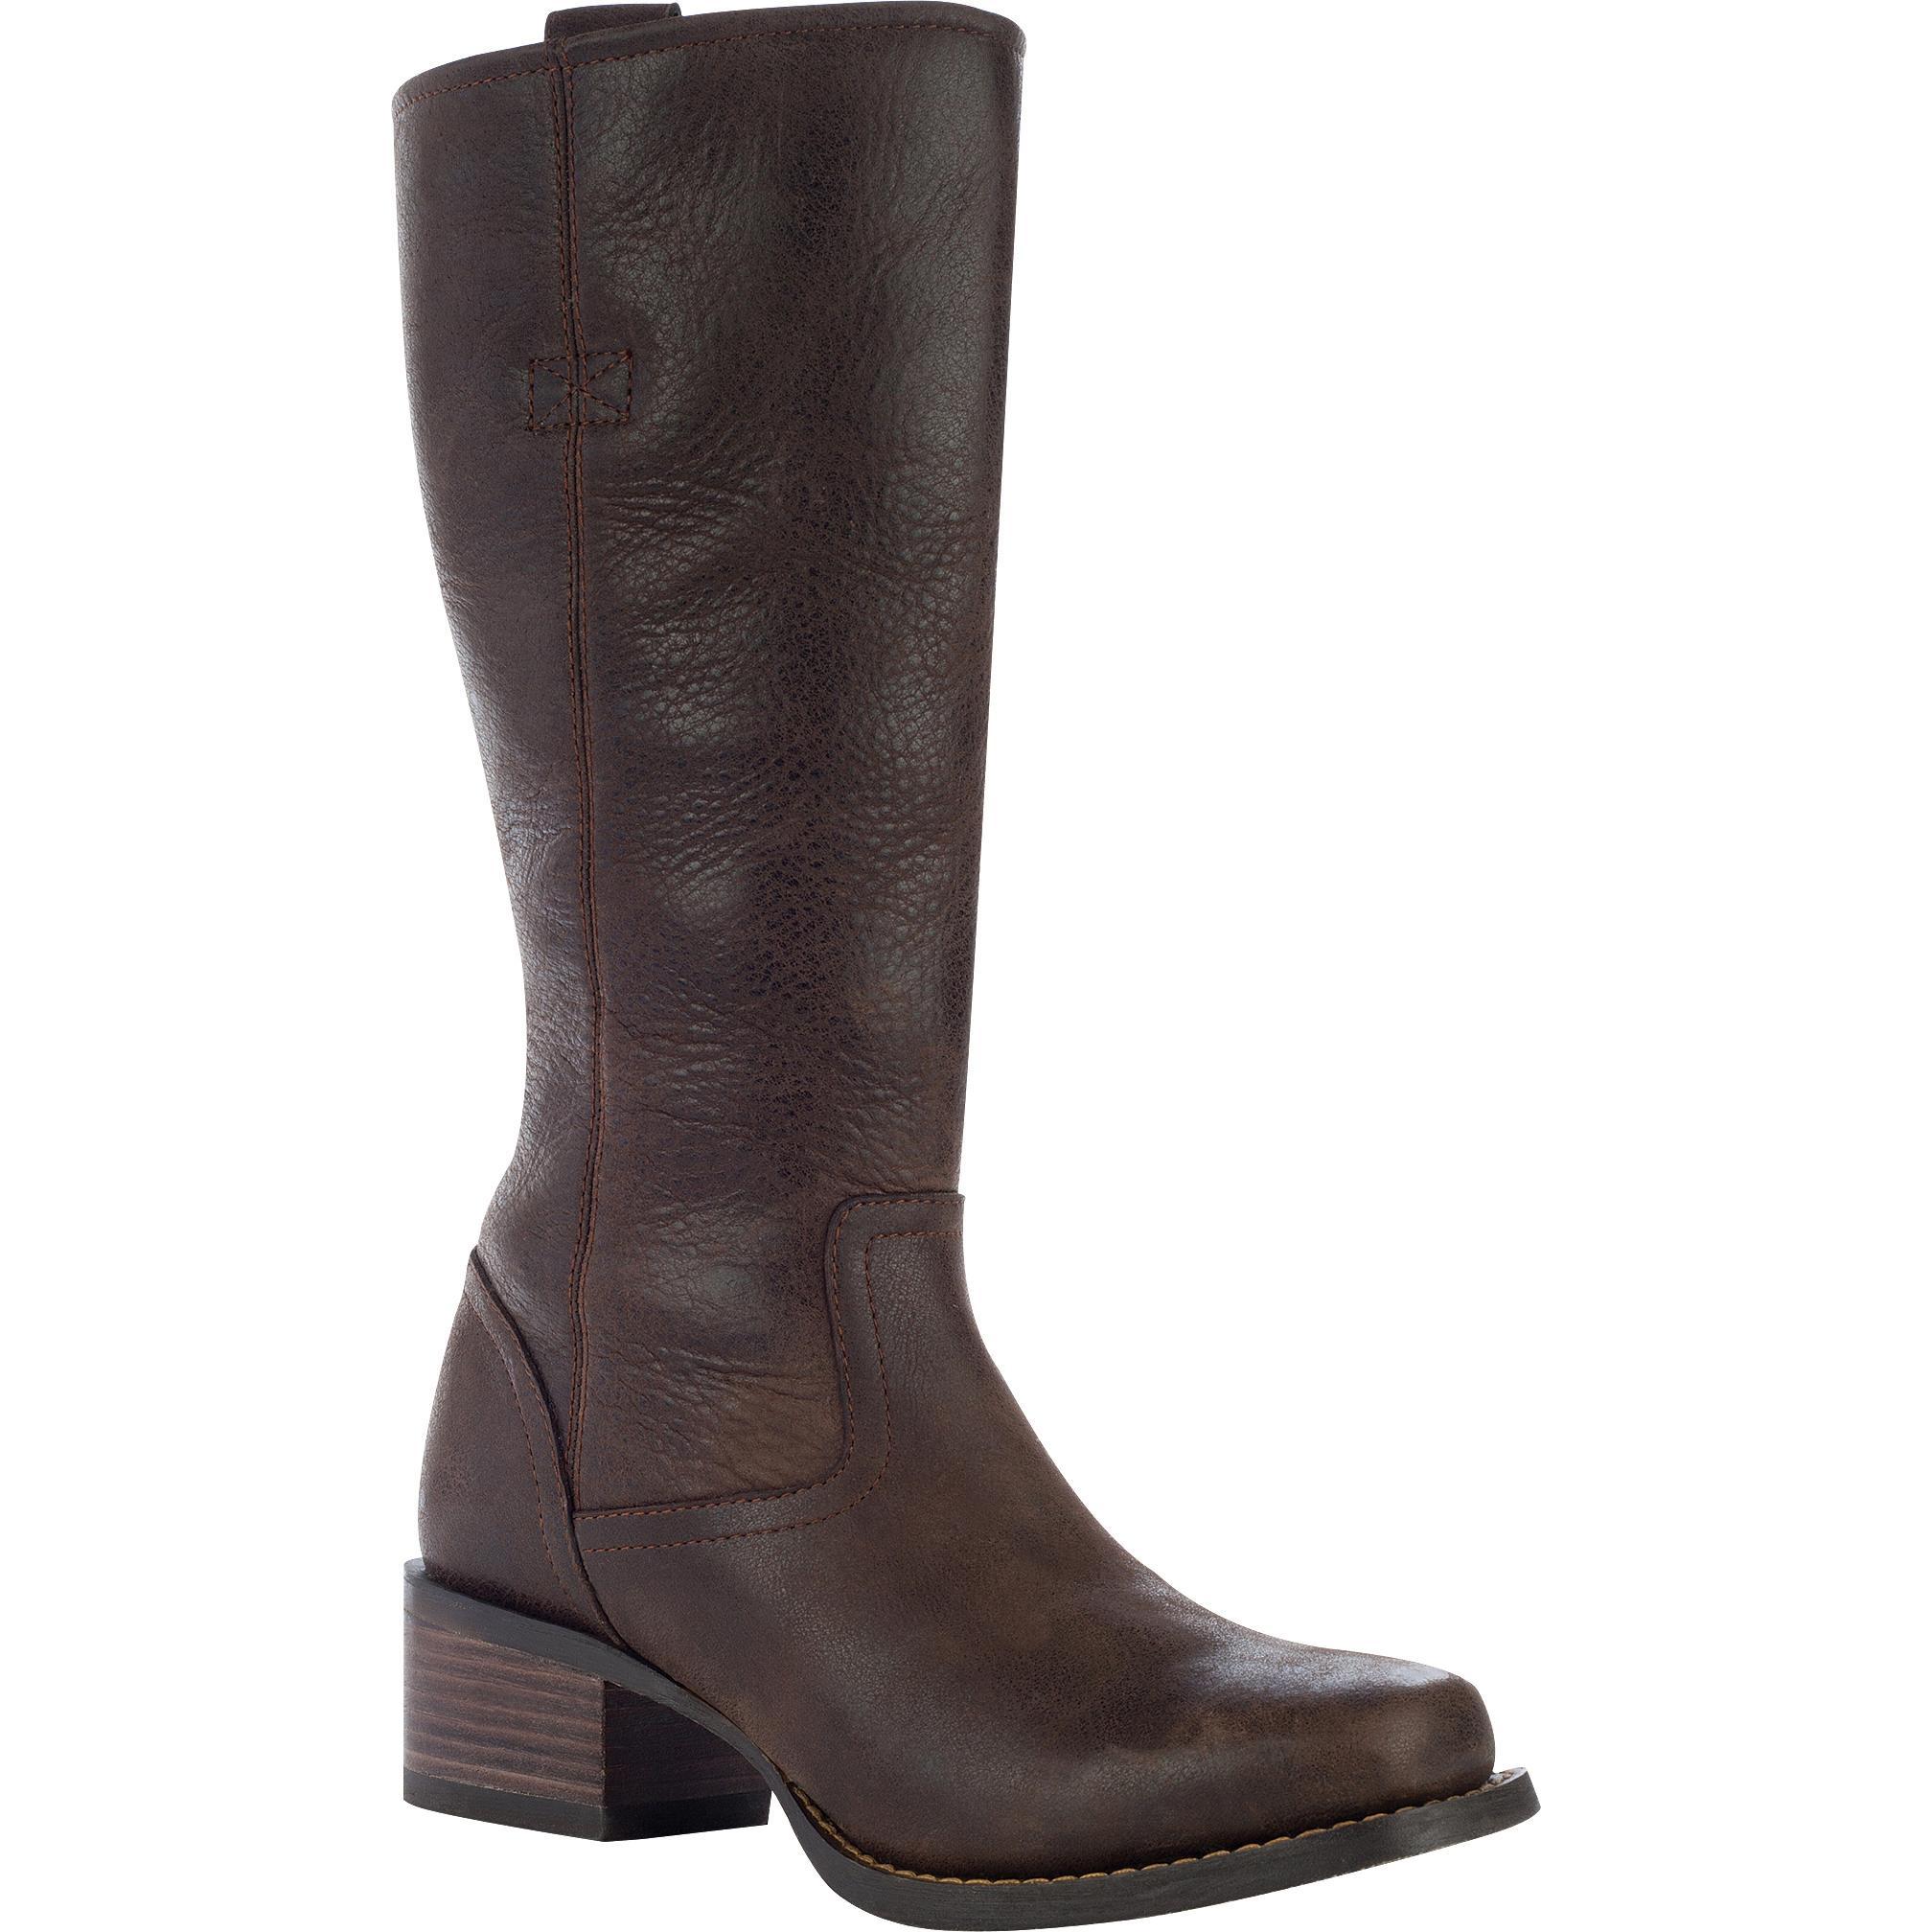 Durango Womens Black Boots Leather Charlotte 12 Inch Zipper